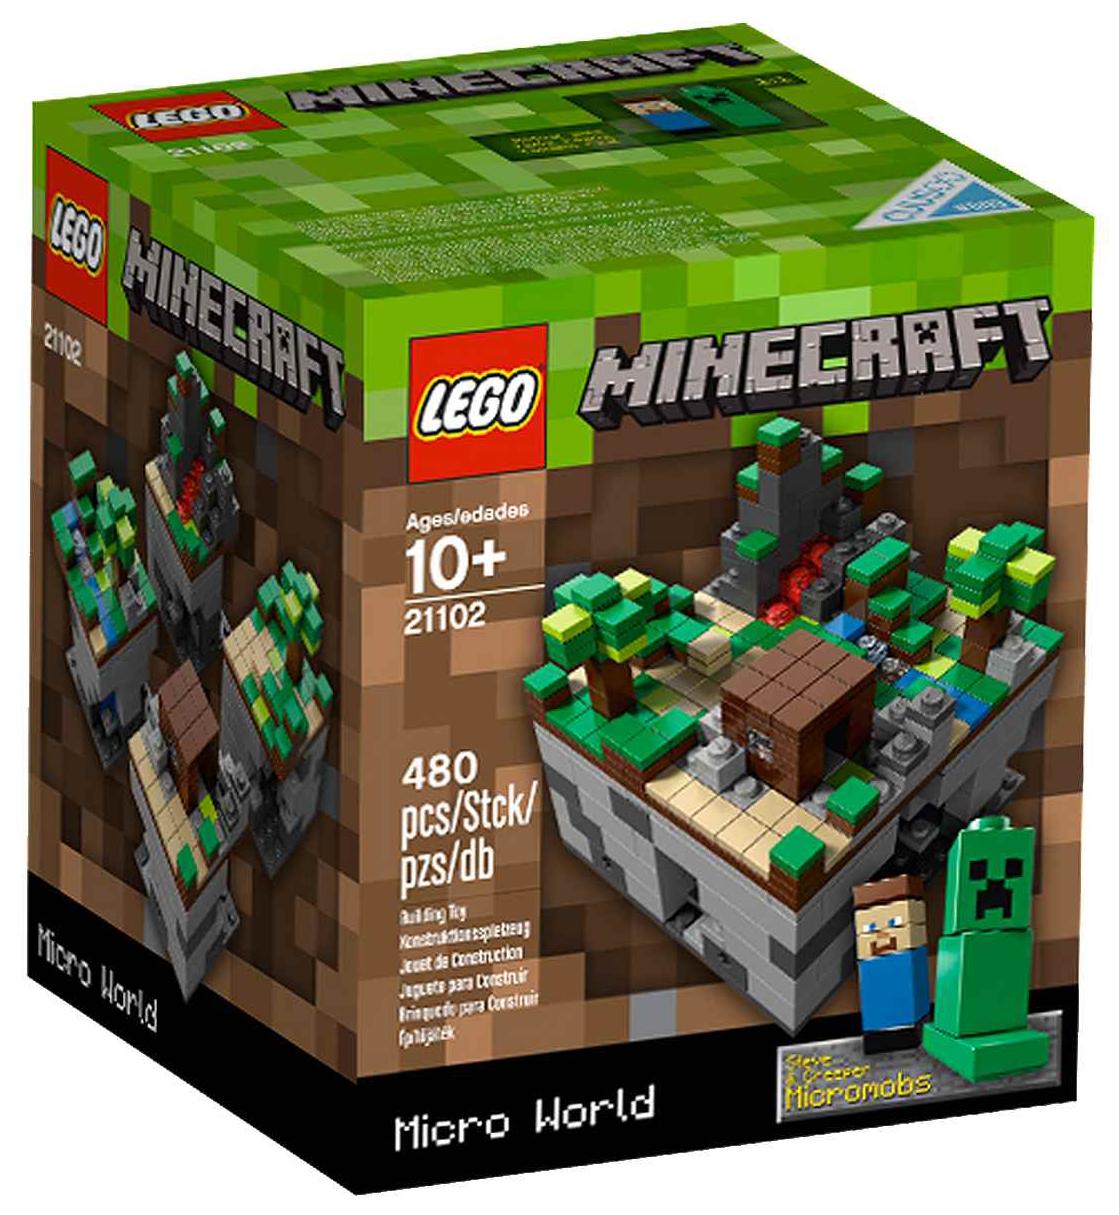 Mining Toys For Boys : Lego minecraft pas cher micro monde la forêt